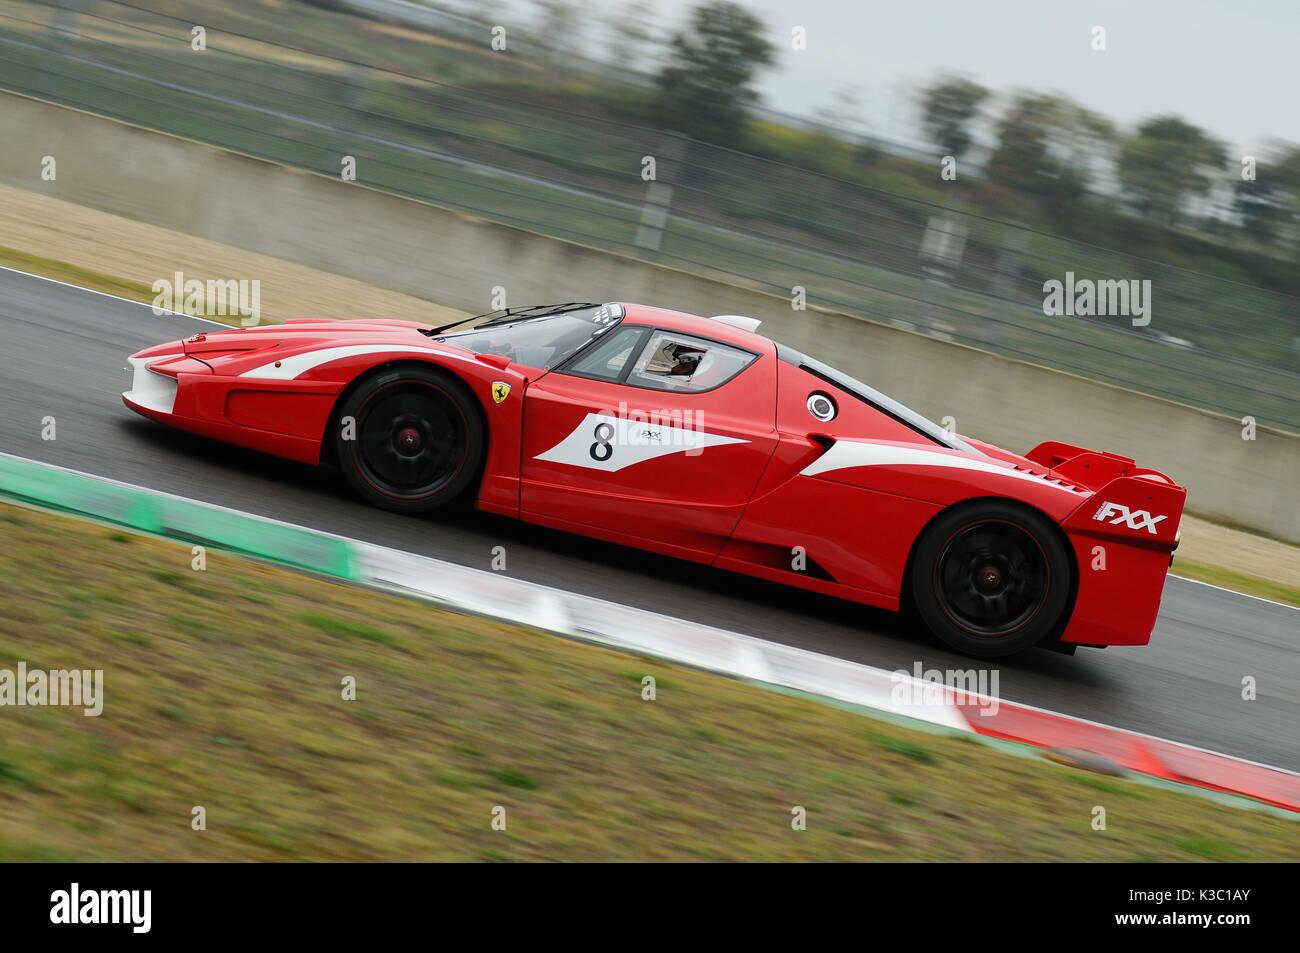 Racing Engine Stock Photos Amp Racing Engine Stock Images